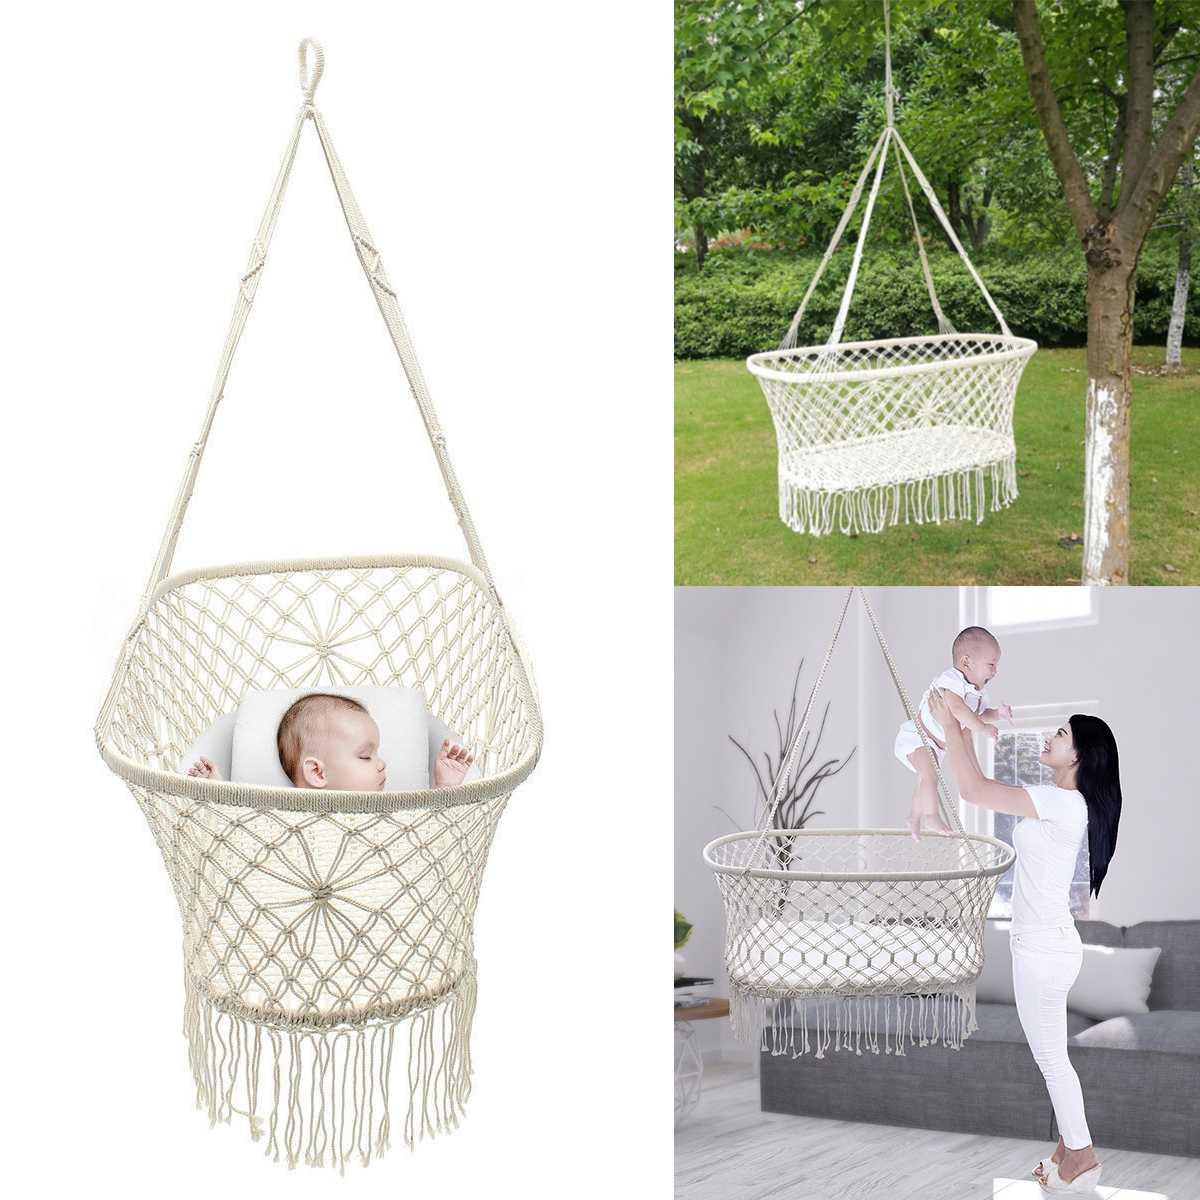 White Cotton Baby Garden Hanging Hammock Cribs Woven Rope